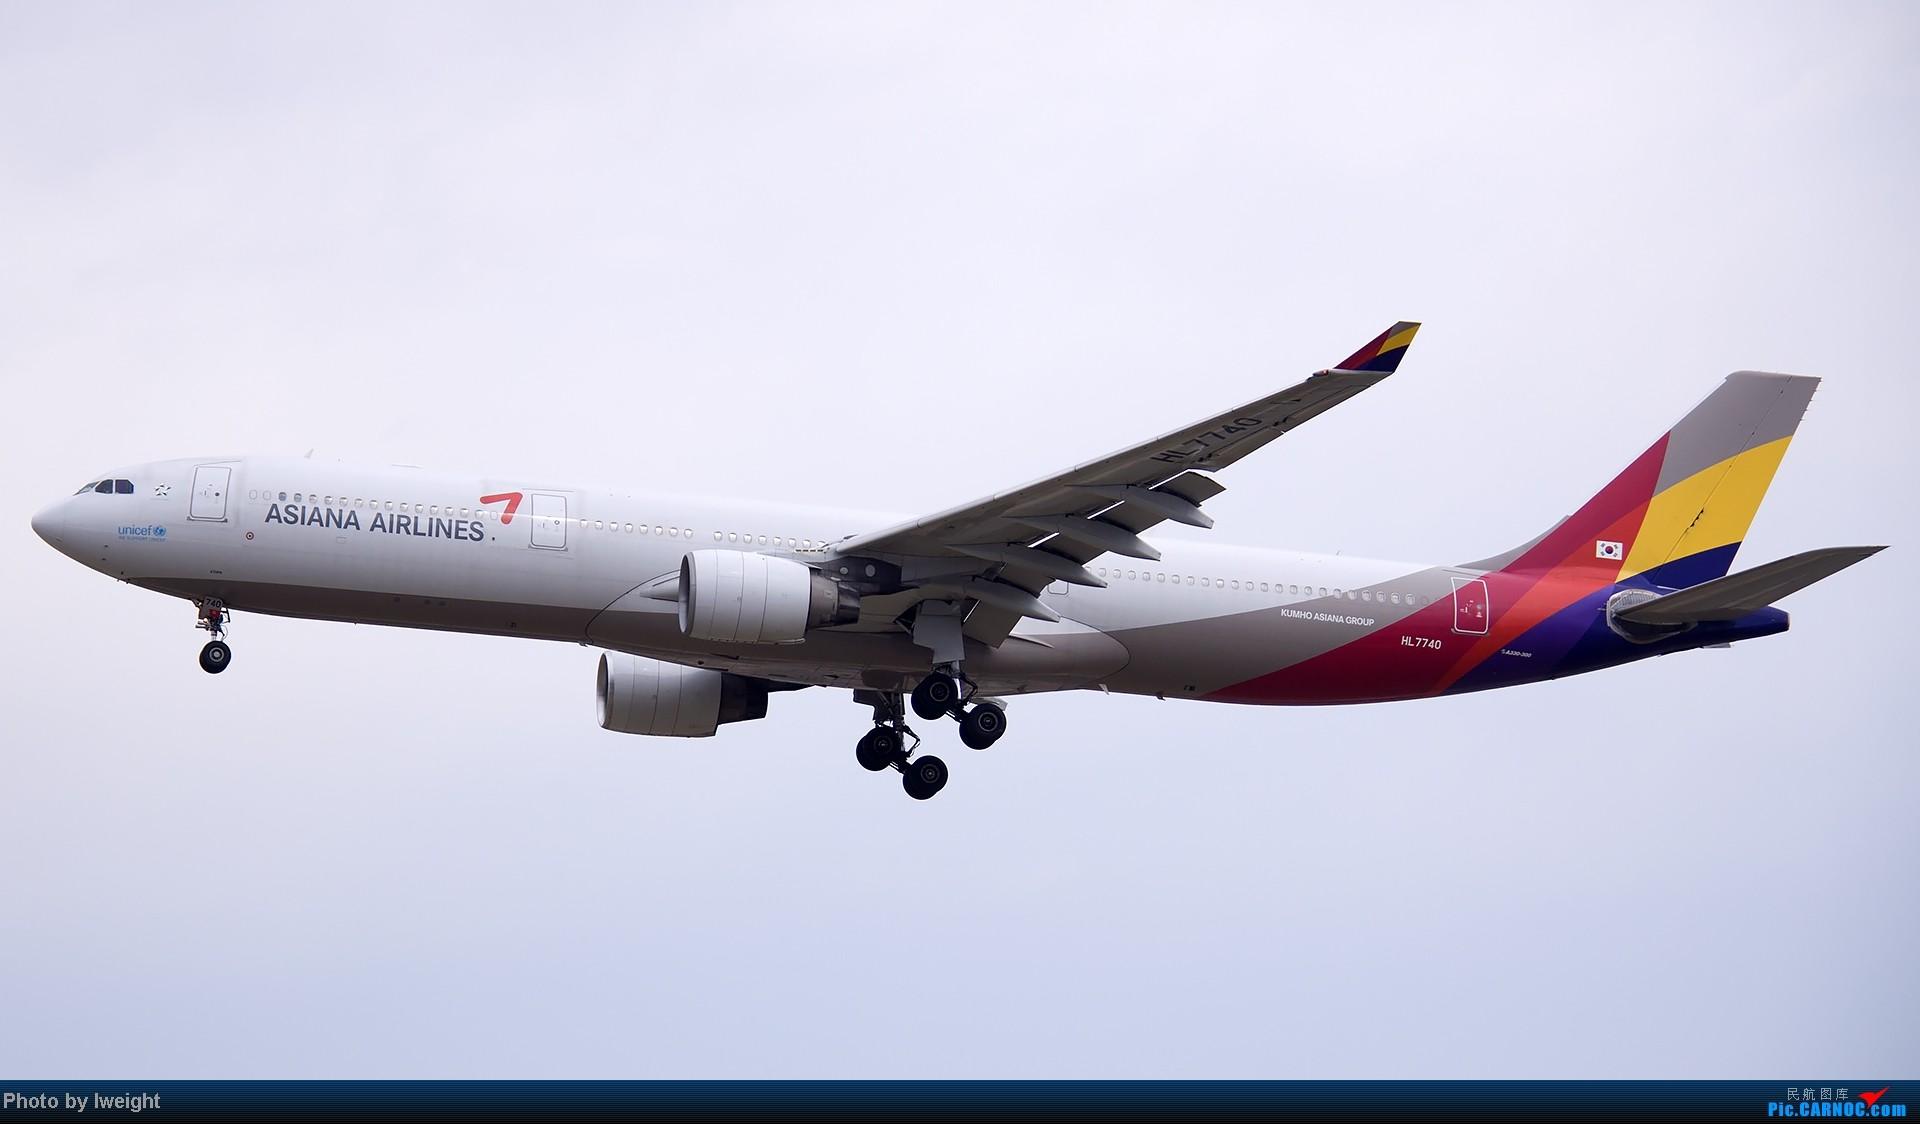 Re:[原创]北京难得的好天气,收获多种机型和彩绘,遗憾的是再次错过卡航巴塞罗那彩绘 AIRBUS A330-300 HL7740 中国北京首都机场